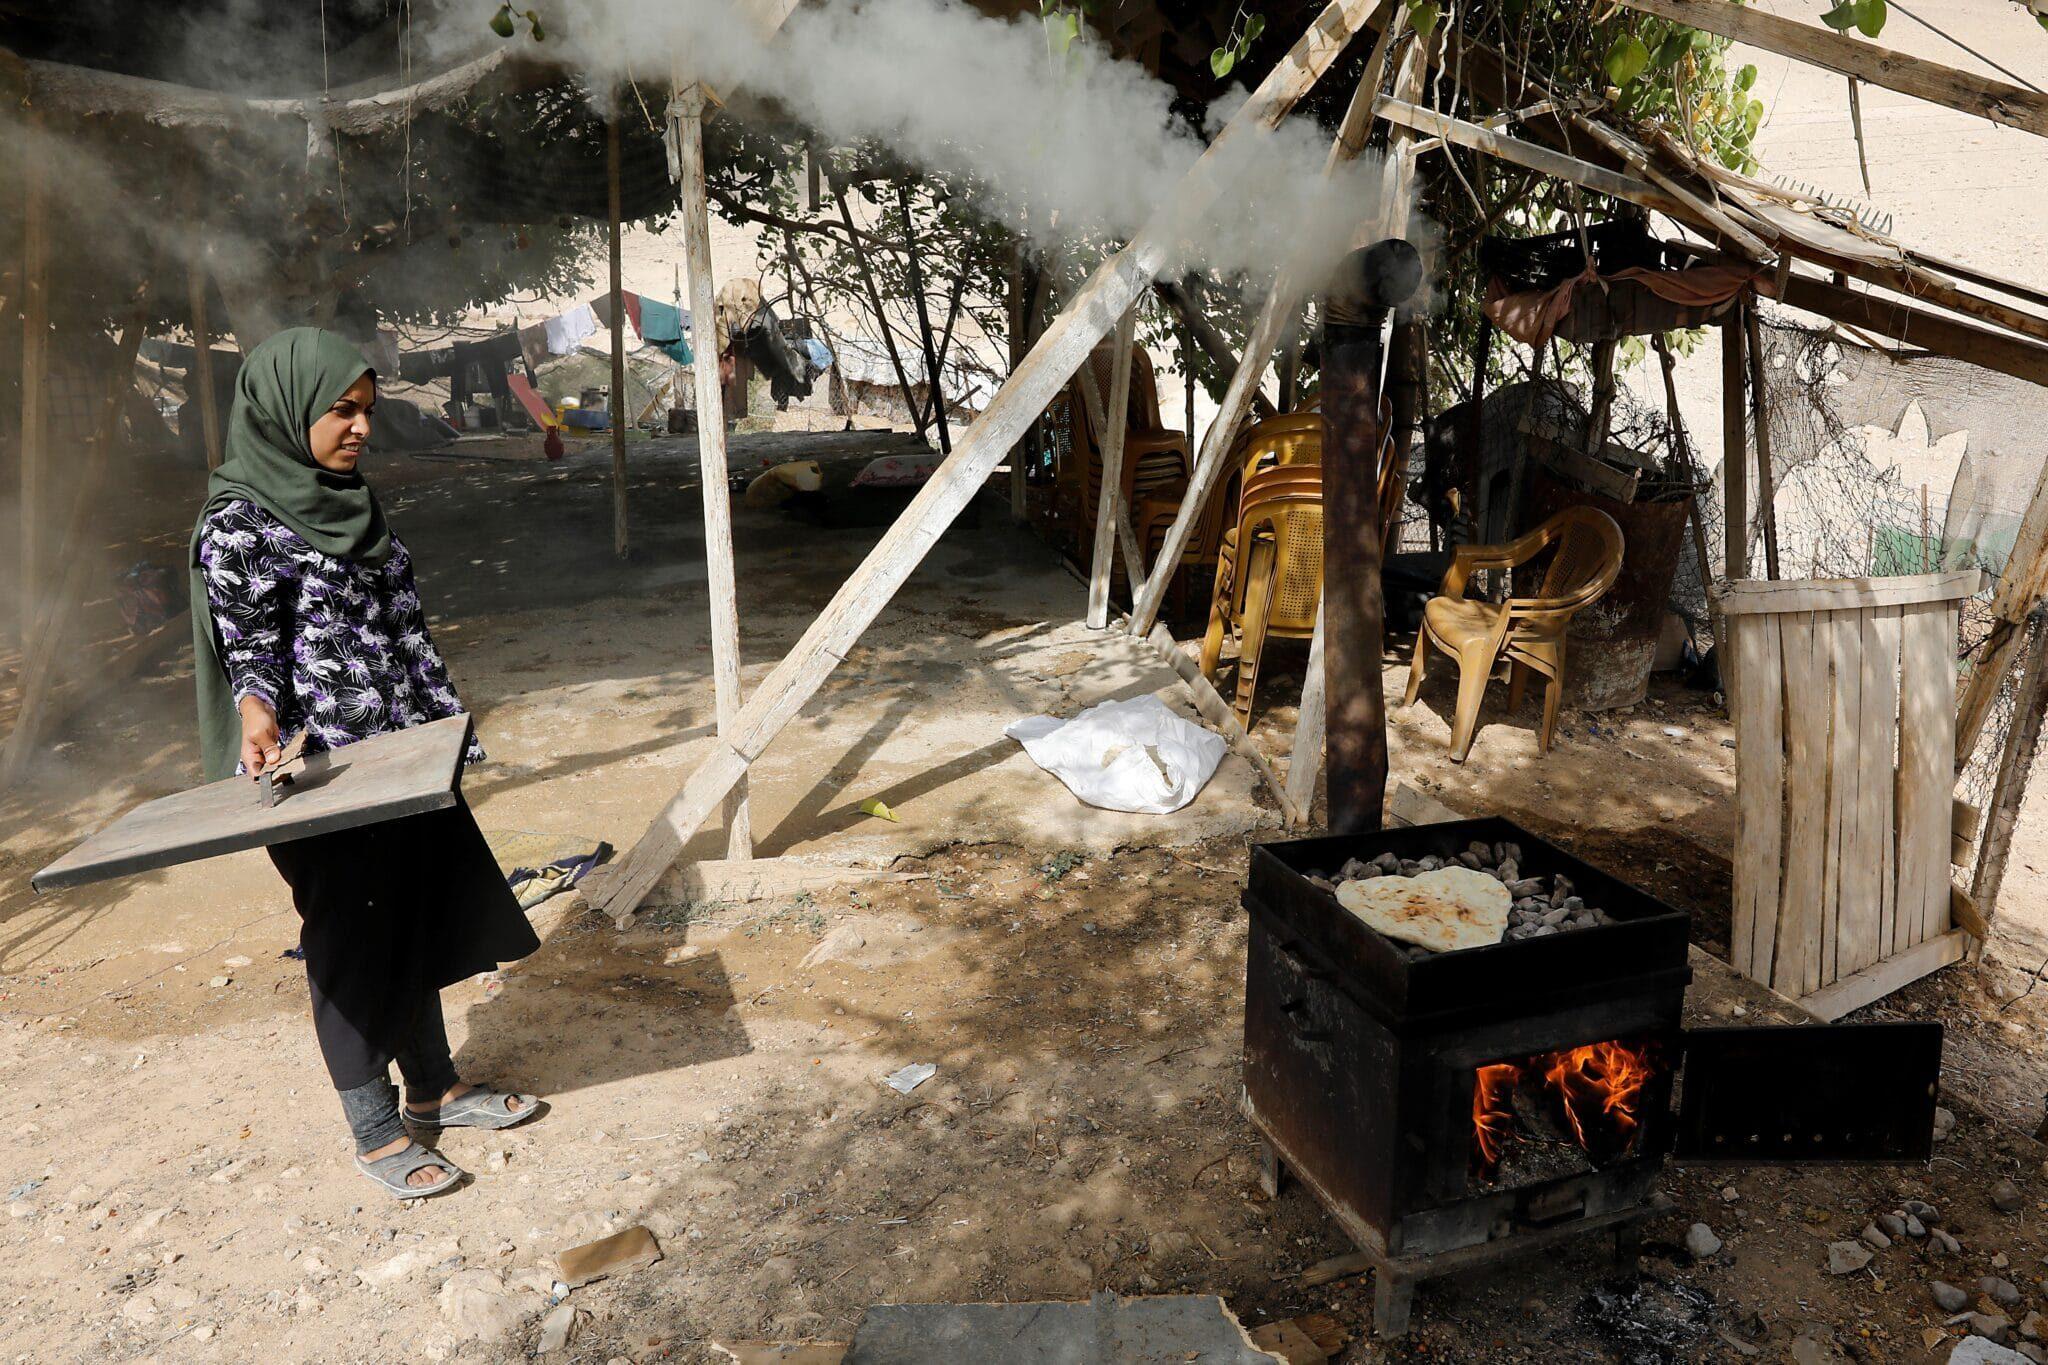 Translation- Palestinian Bedouin